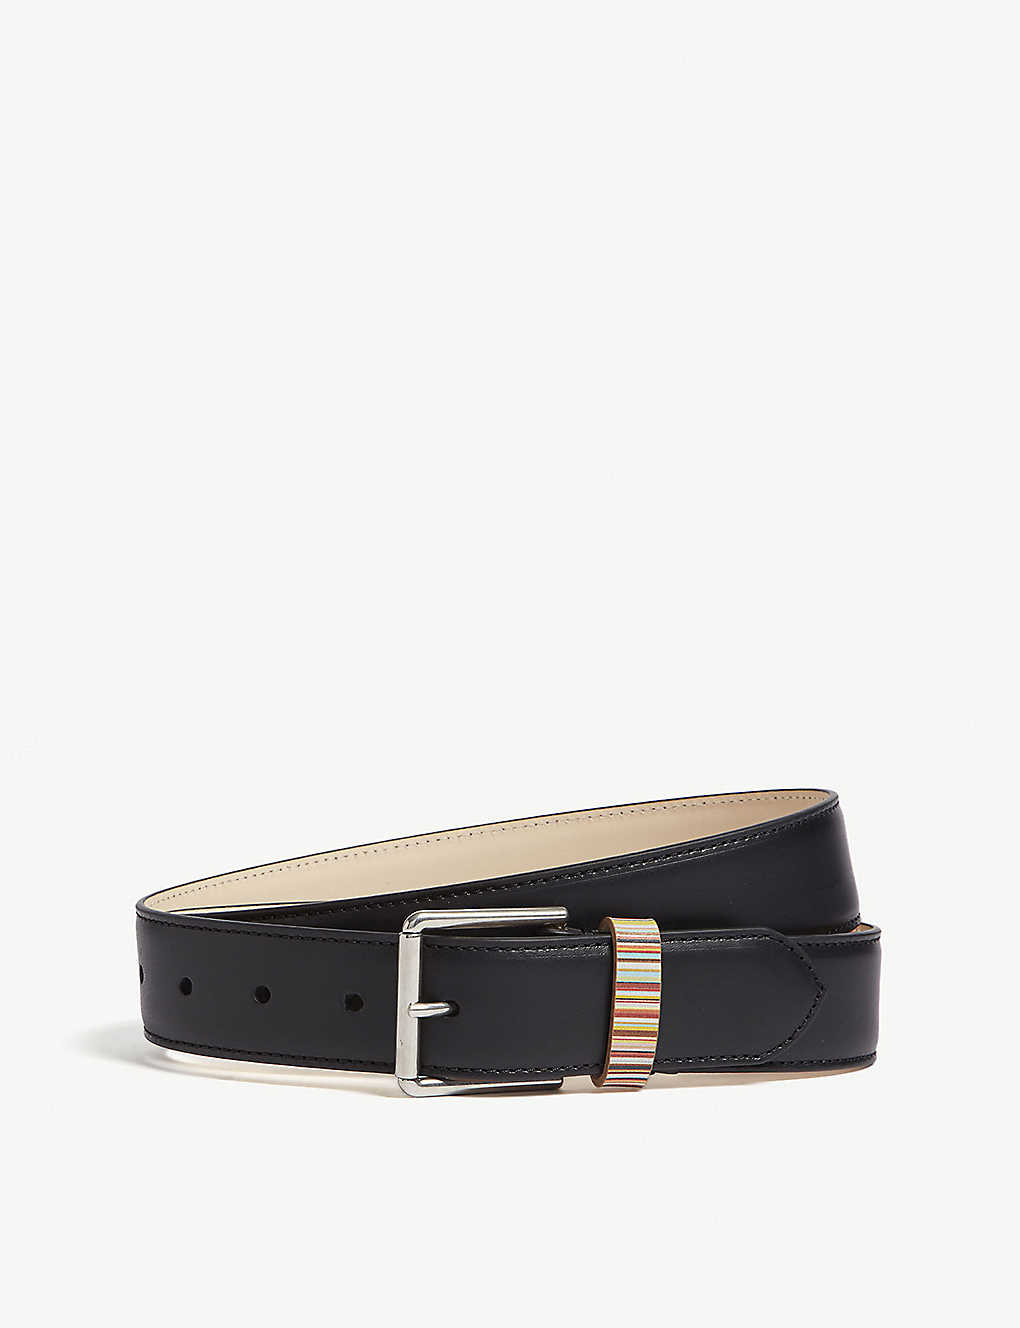 a7a97db22e6b9 PAUL SMITH ACCESSORIES - Vintage multi-striped keeper belt ...